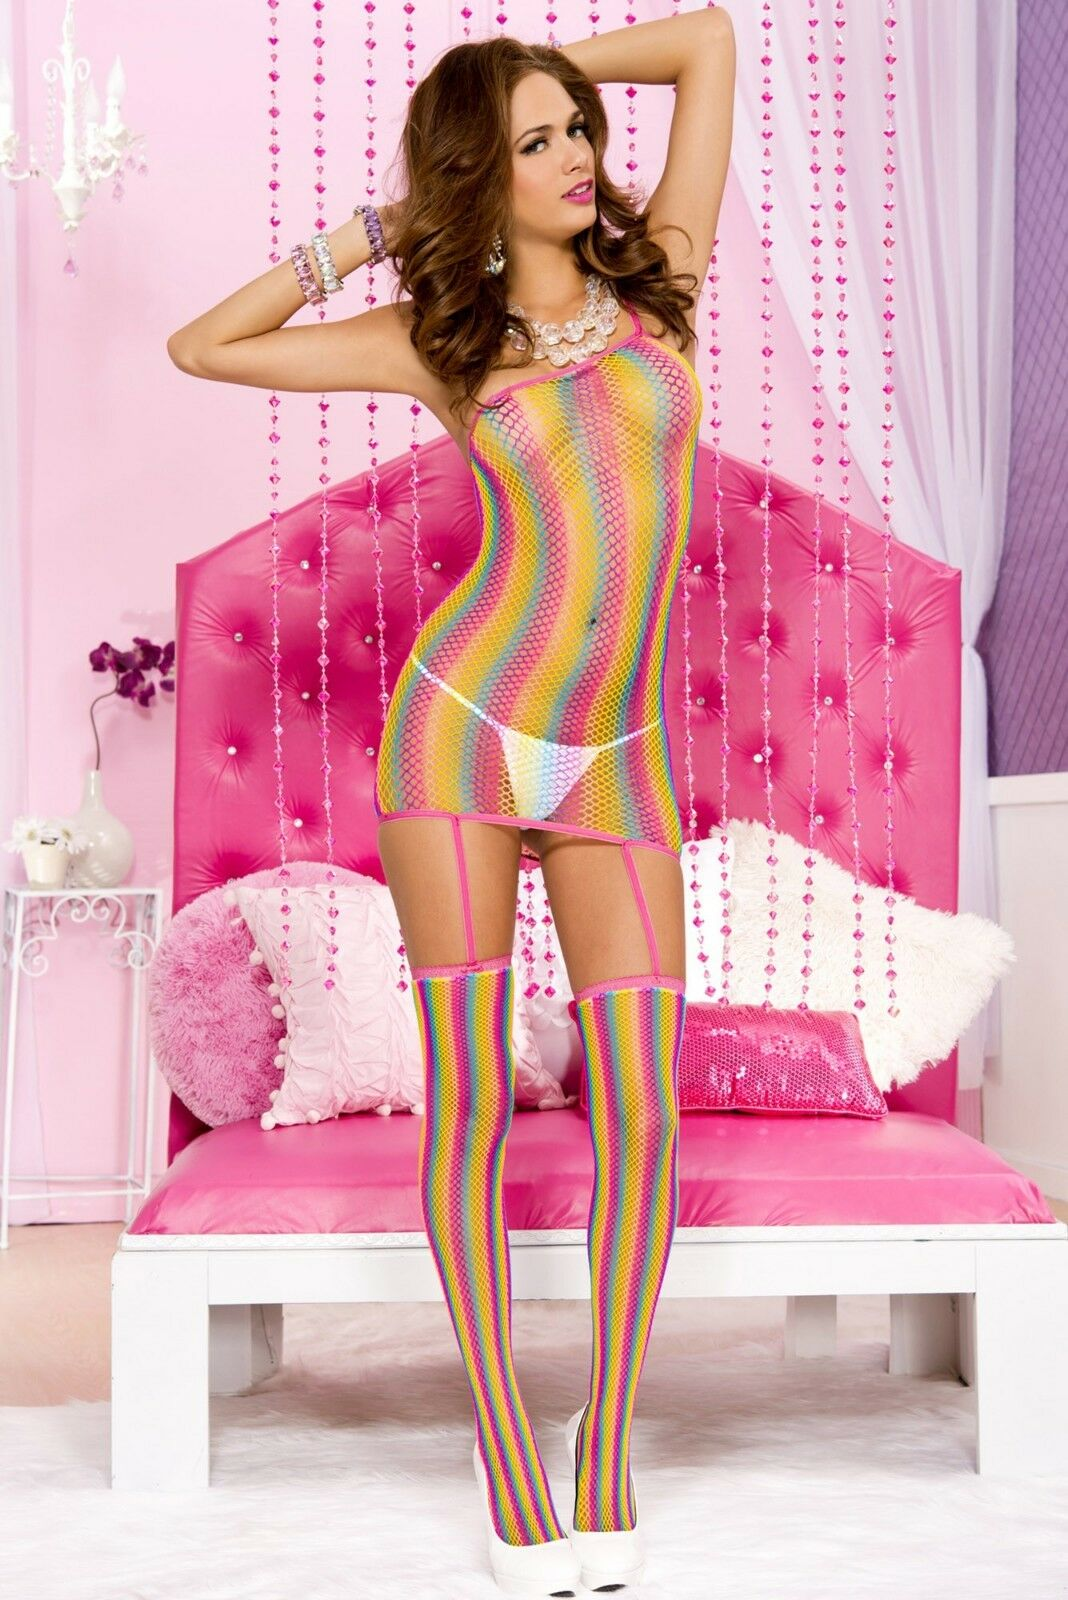 38834db3bc0bc XL Rainbow Fishnet Garter Chemise Stockings Plus Size Lingerie ...